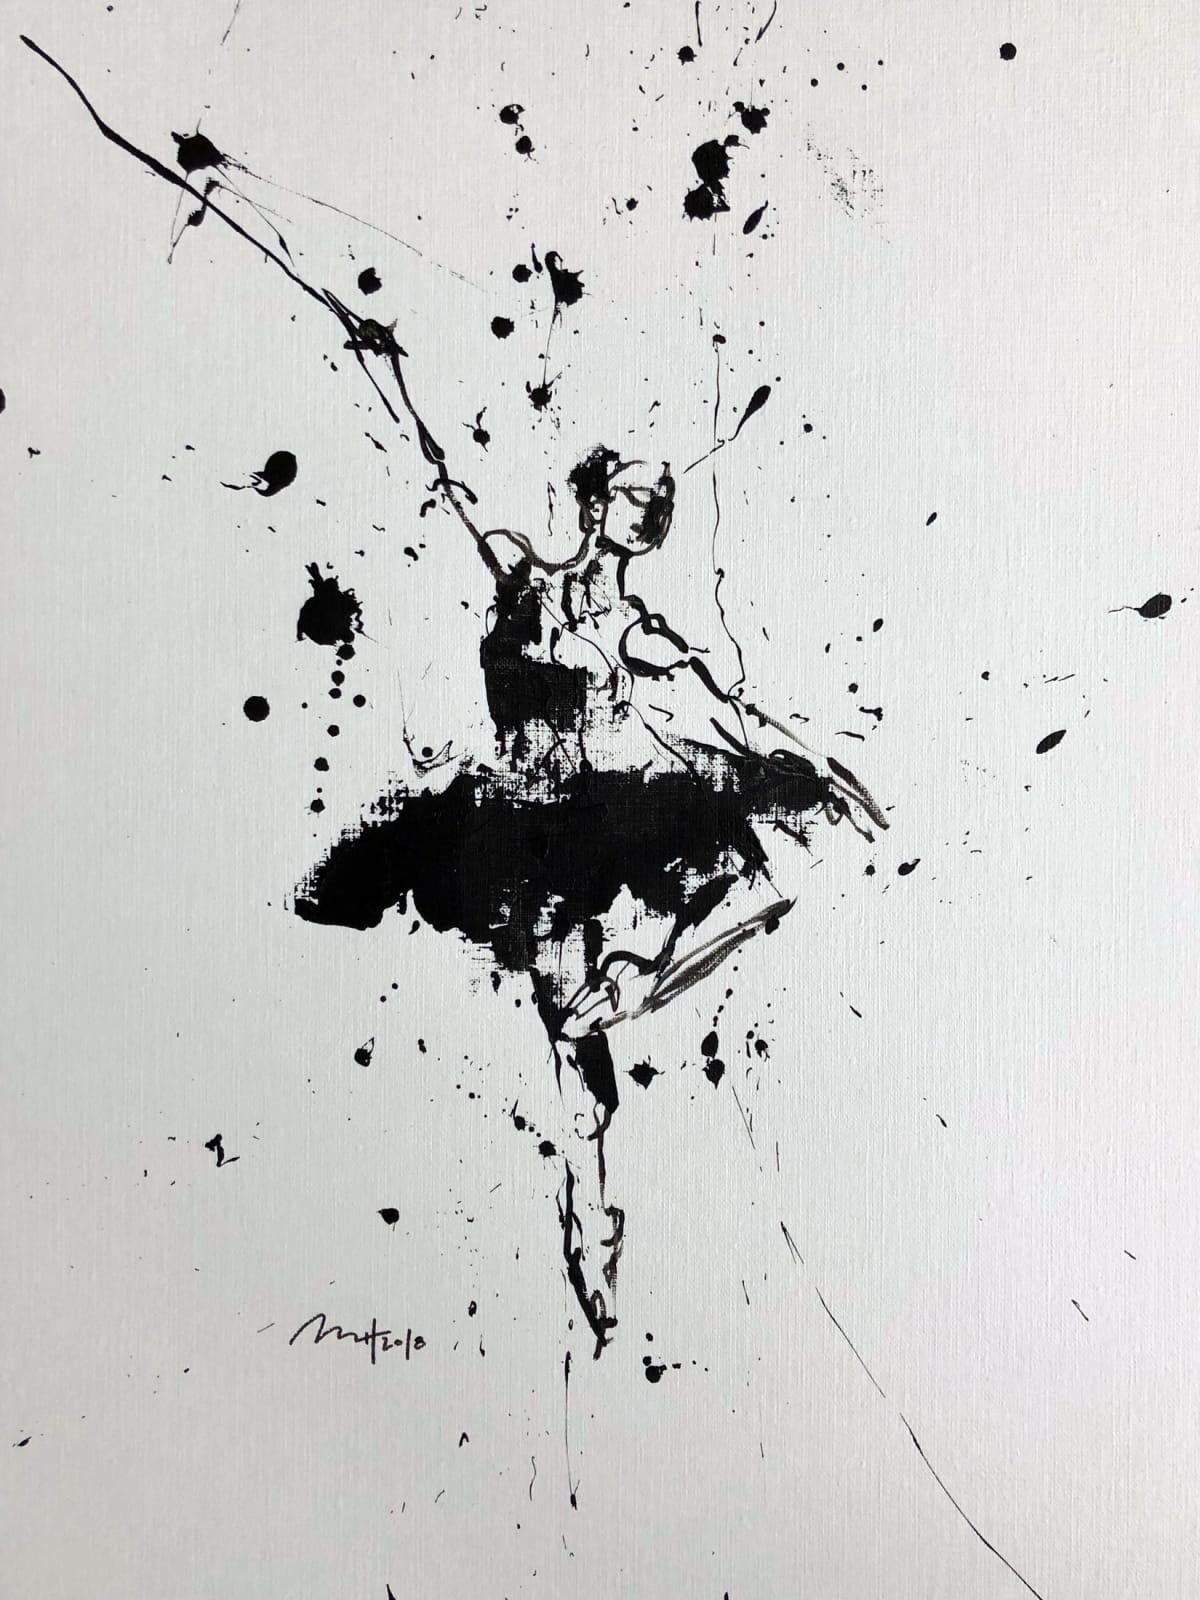 Mario Henrique, Ballerina No. 15, 2018